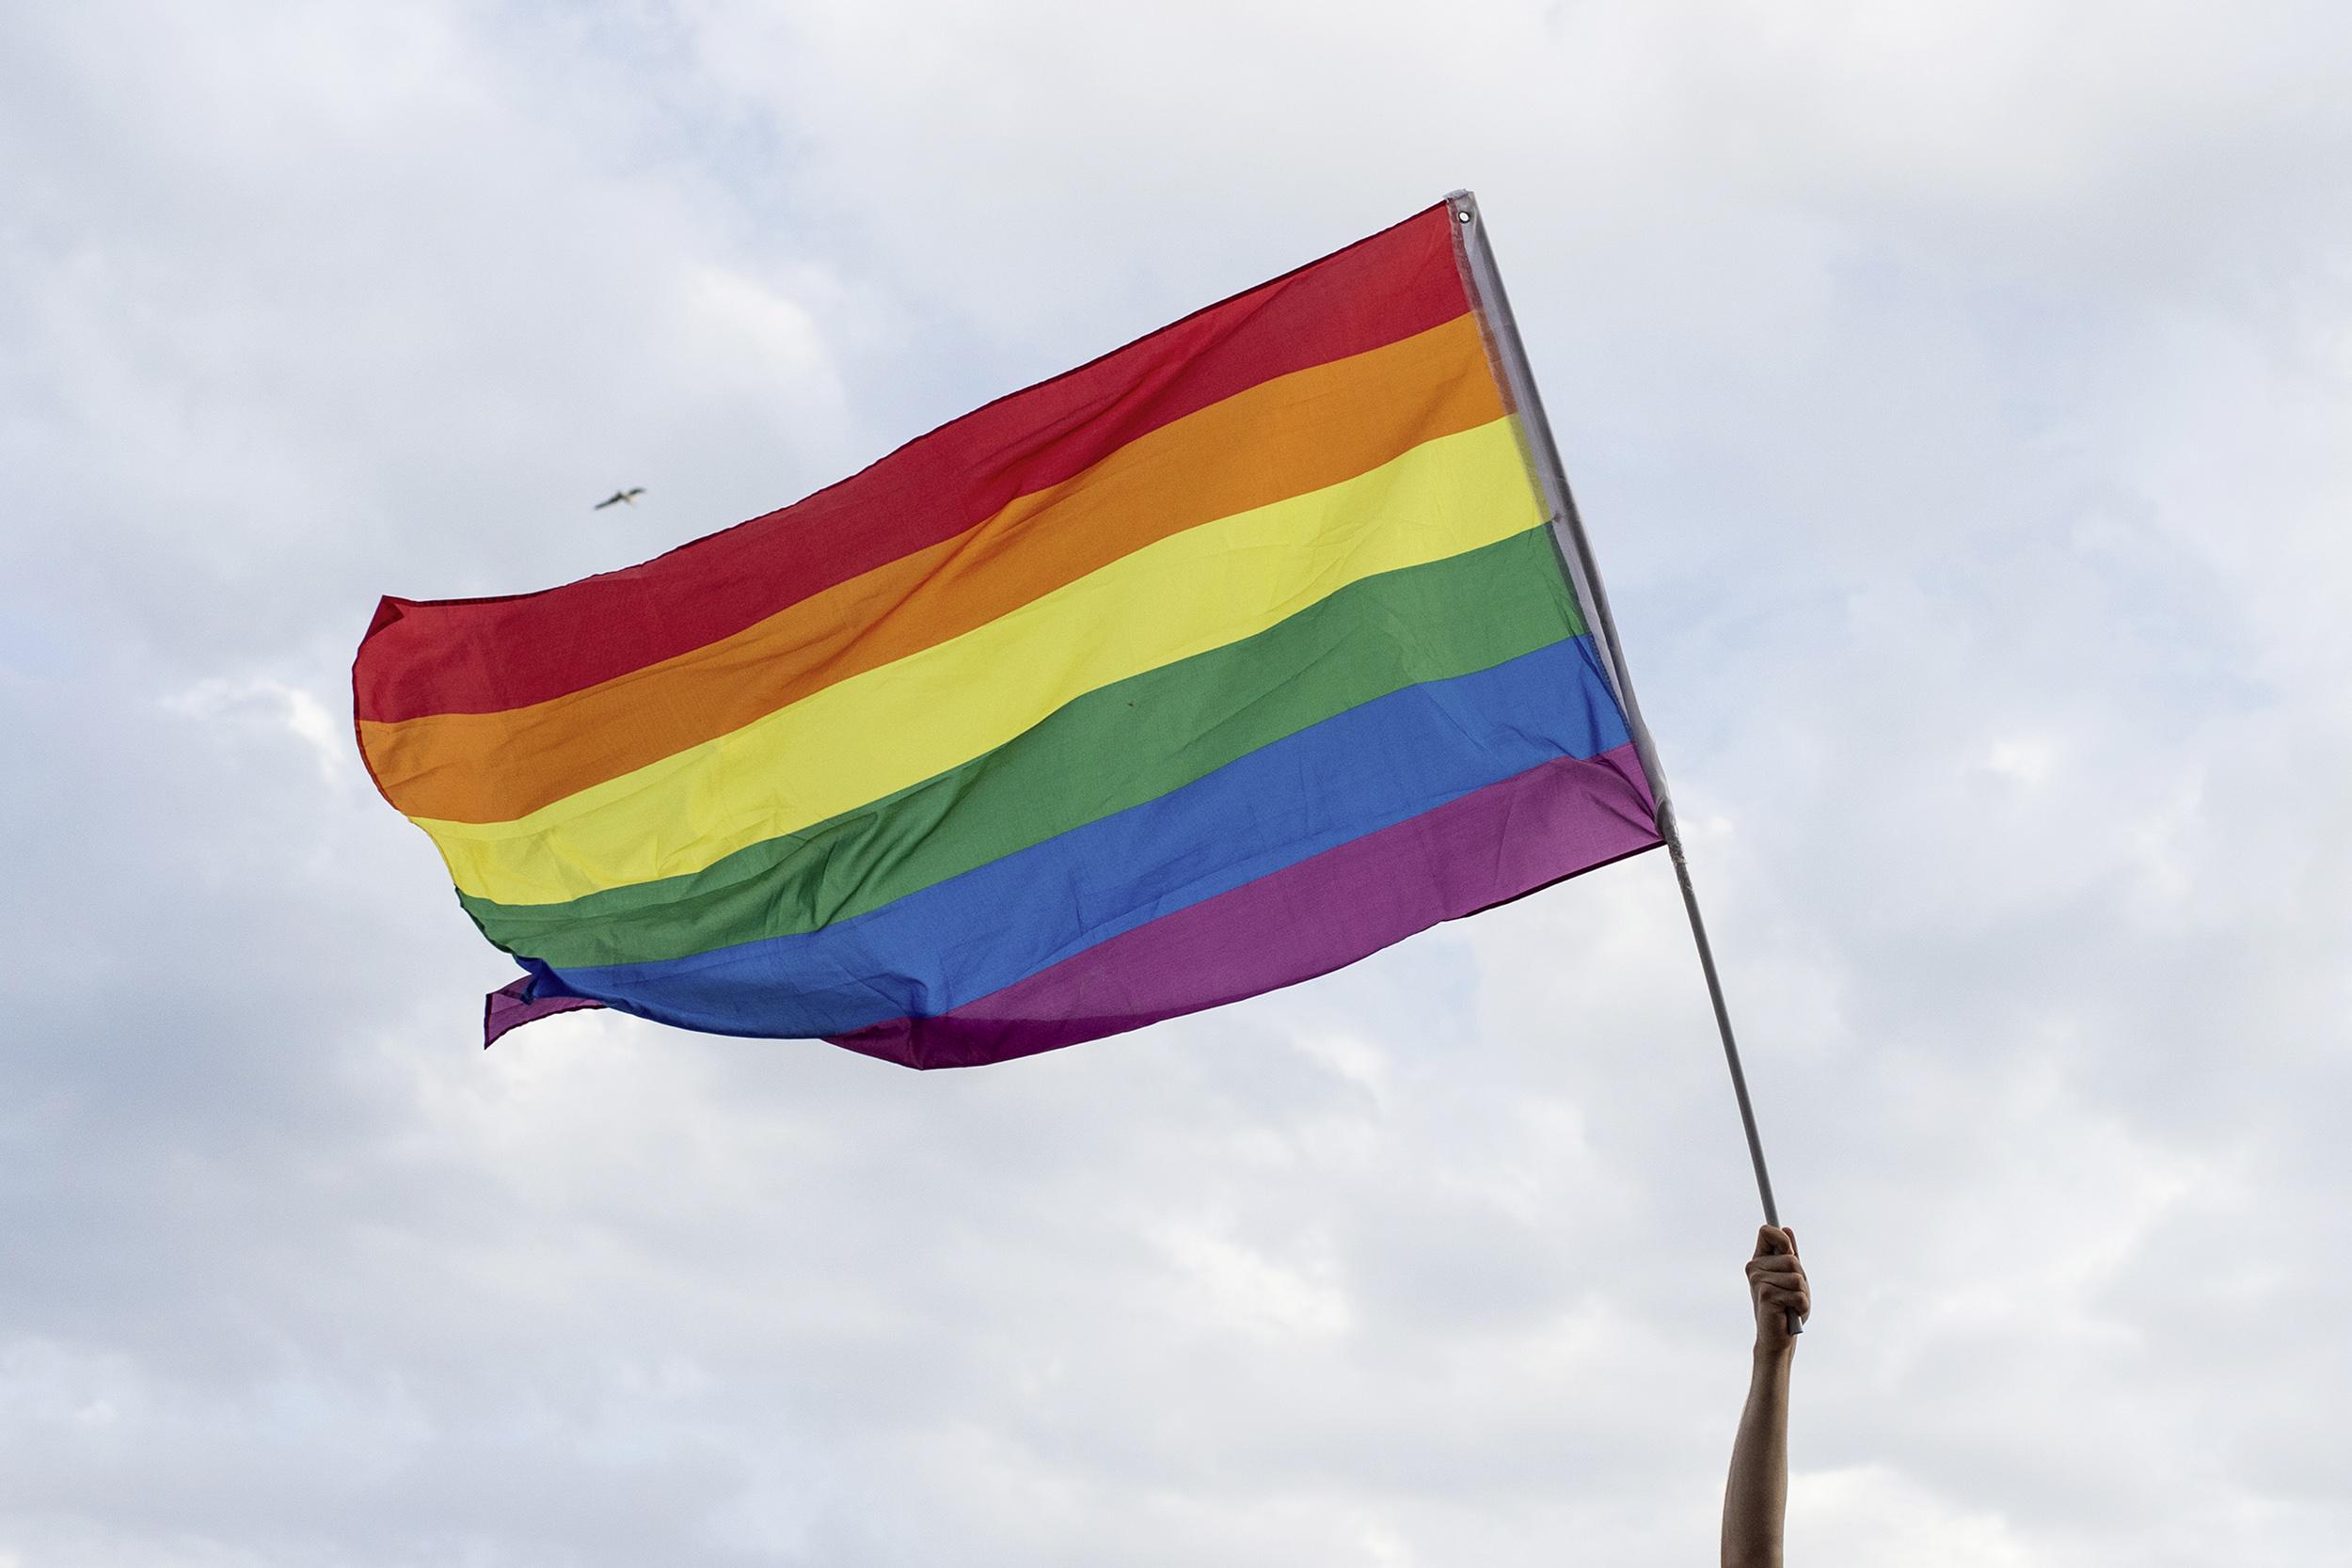 Teacher faces backlash for suggesting student pledge allegiance to Pride flag